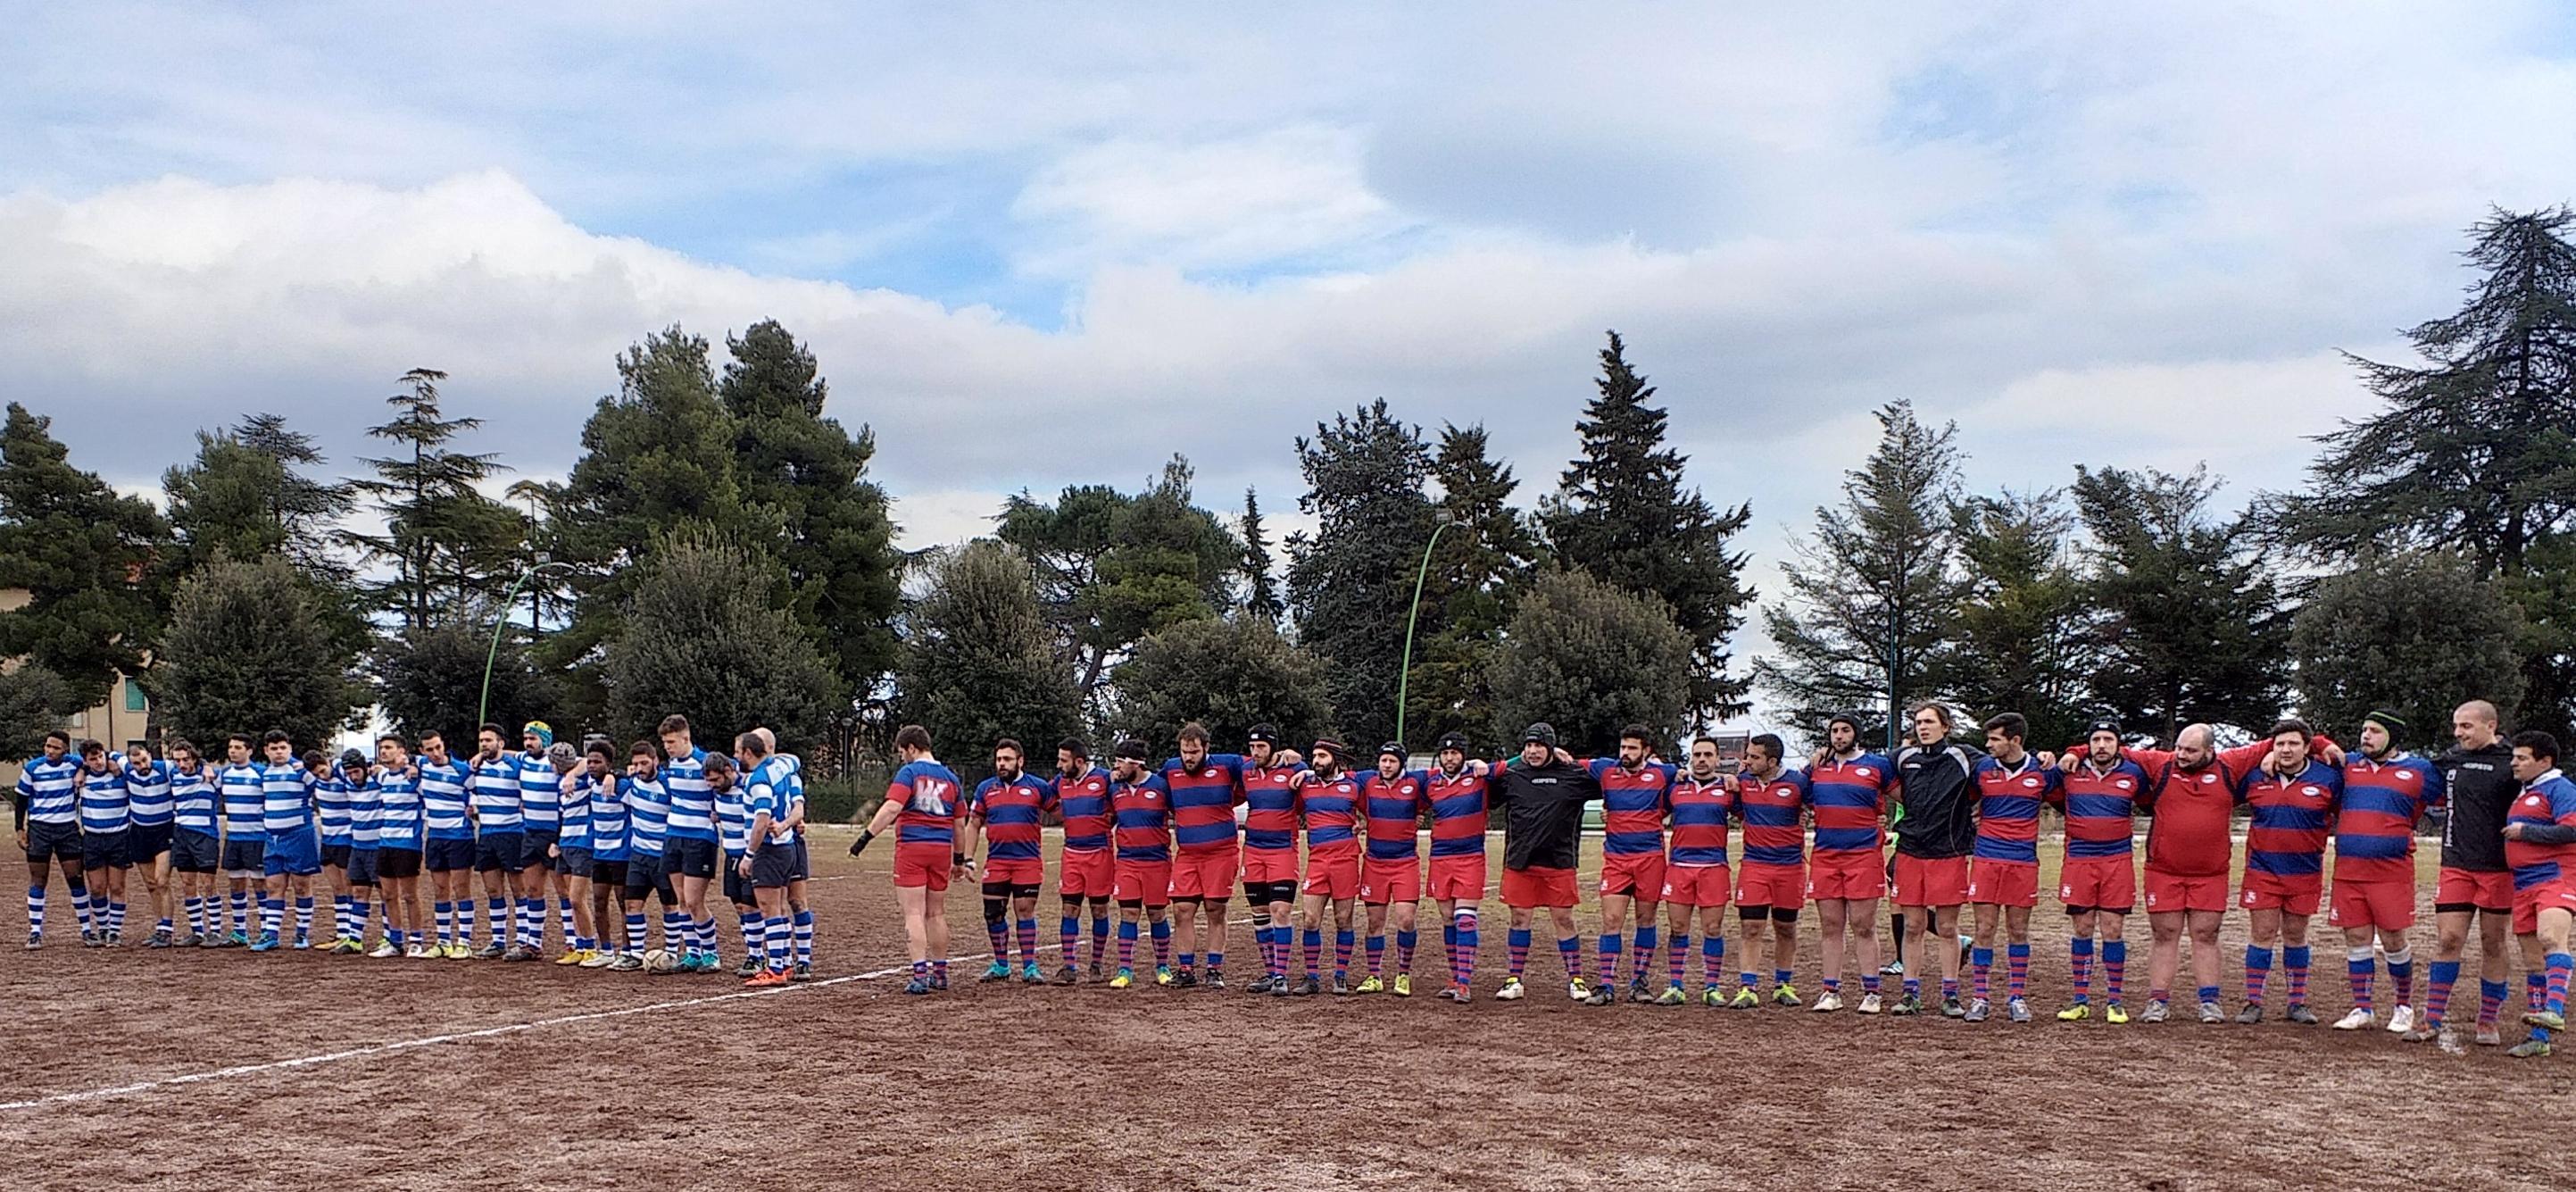 Rugby – IV Circolo vittorioso in C1, Partenope sconfitta in C2